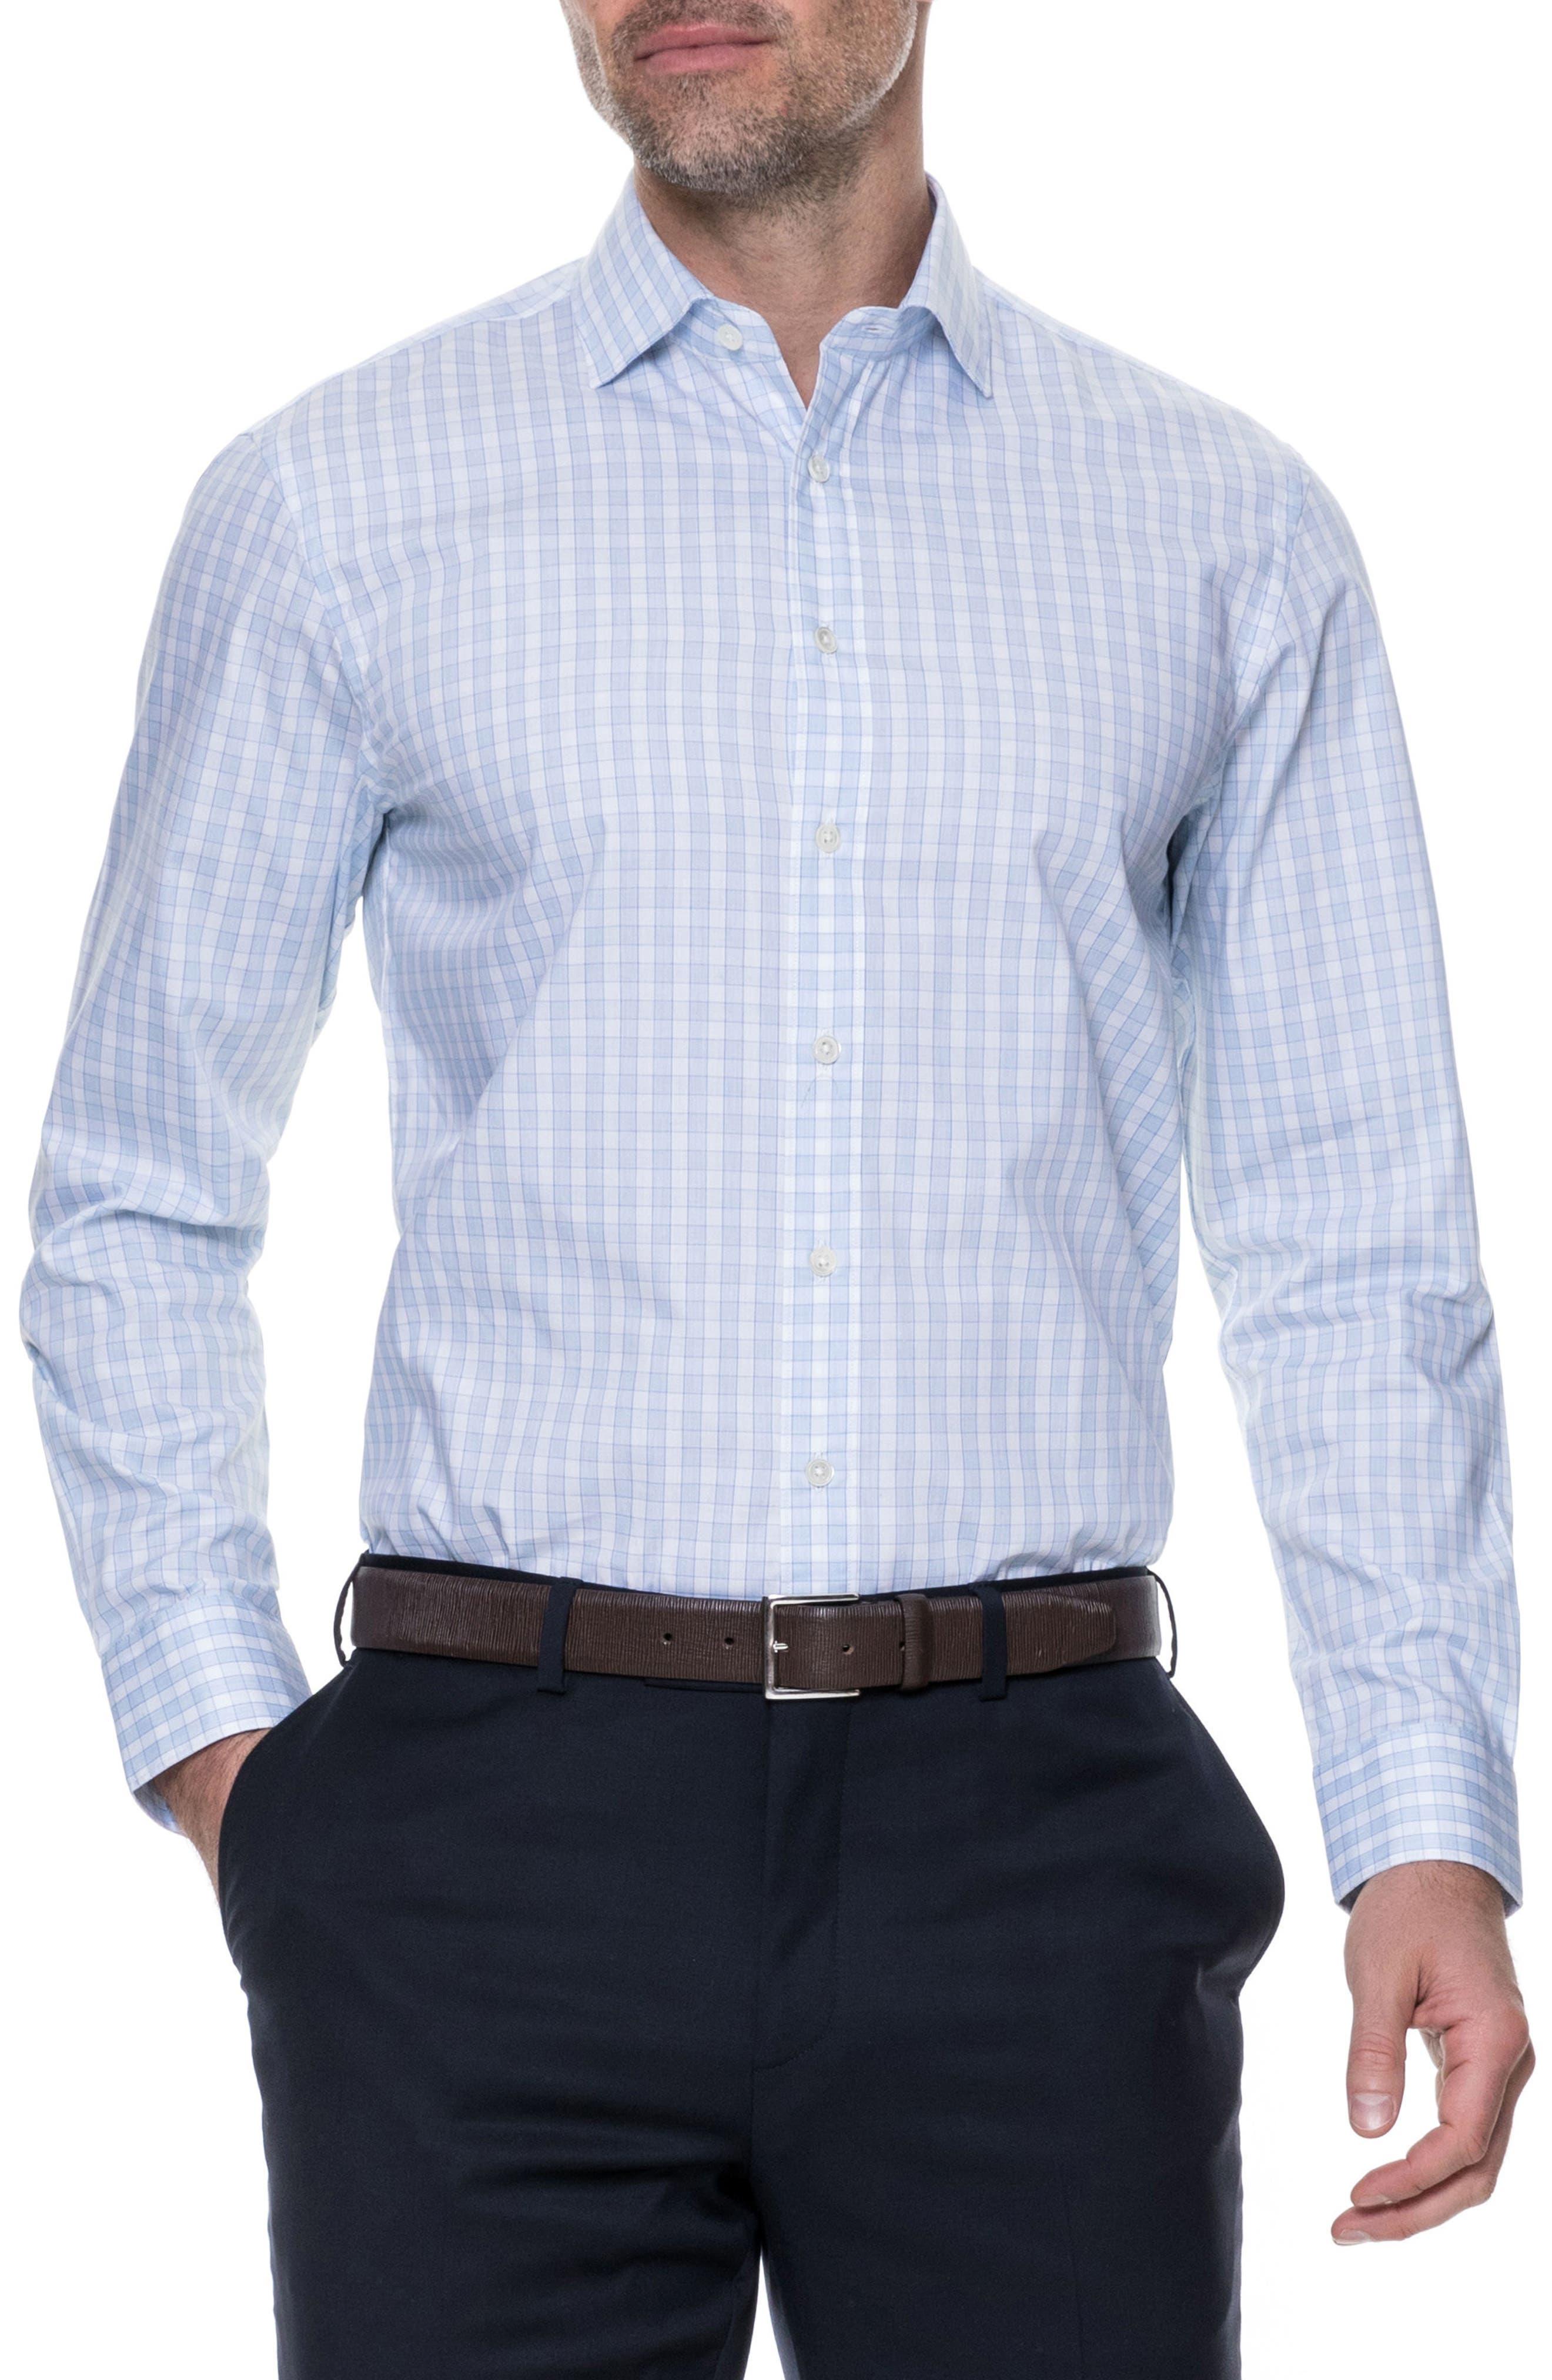 Brackley Slim Fit Sport Shirt,                         Main,                         color, Sky